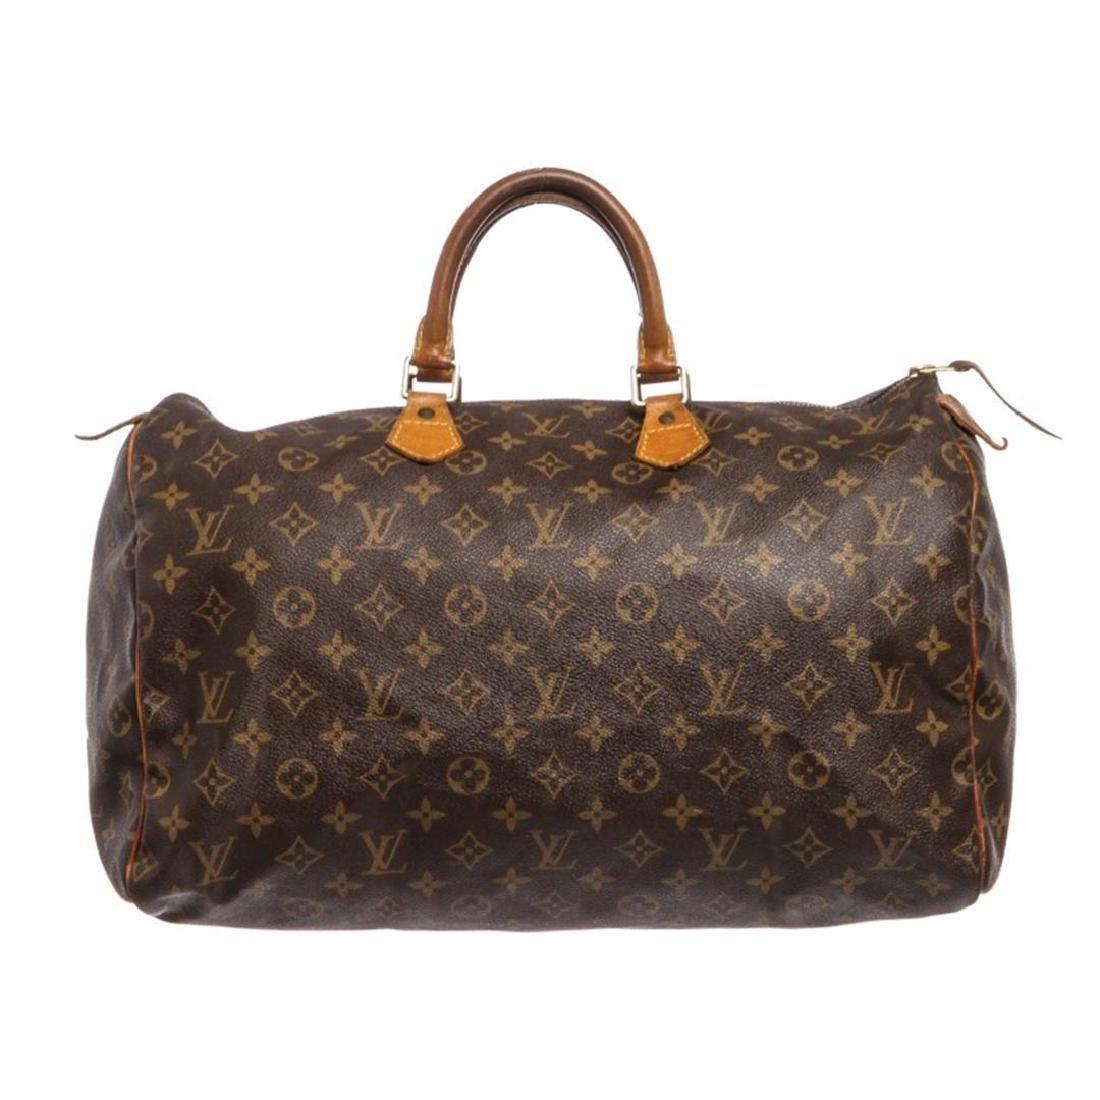 Louis Vuitton Monogram Canvas Leather Speedy 40 cm Bag